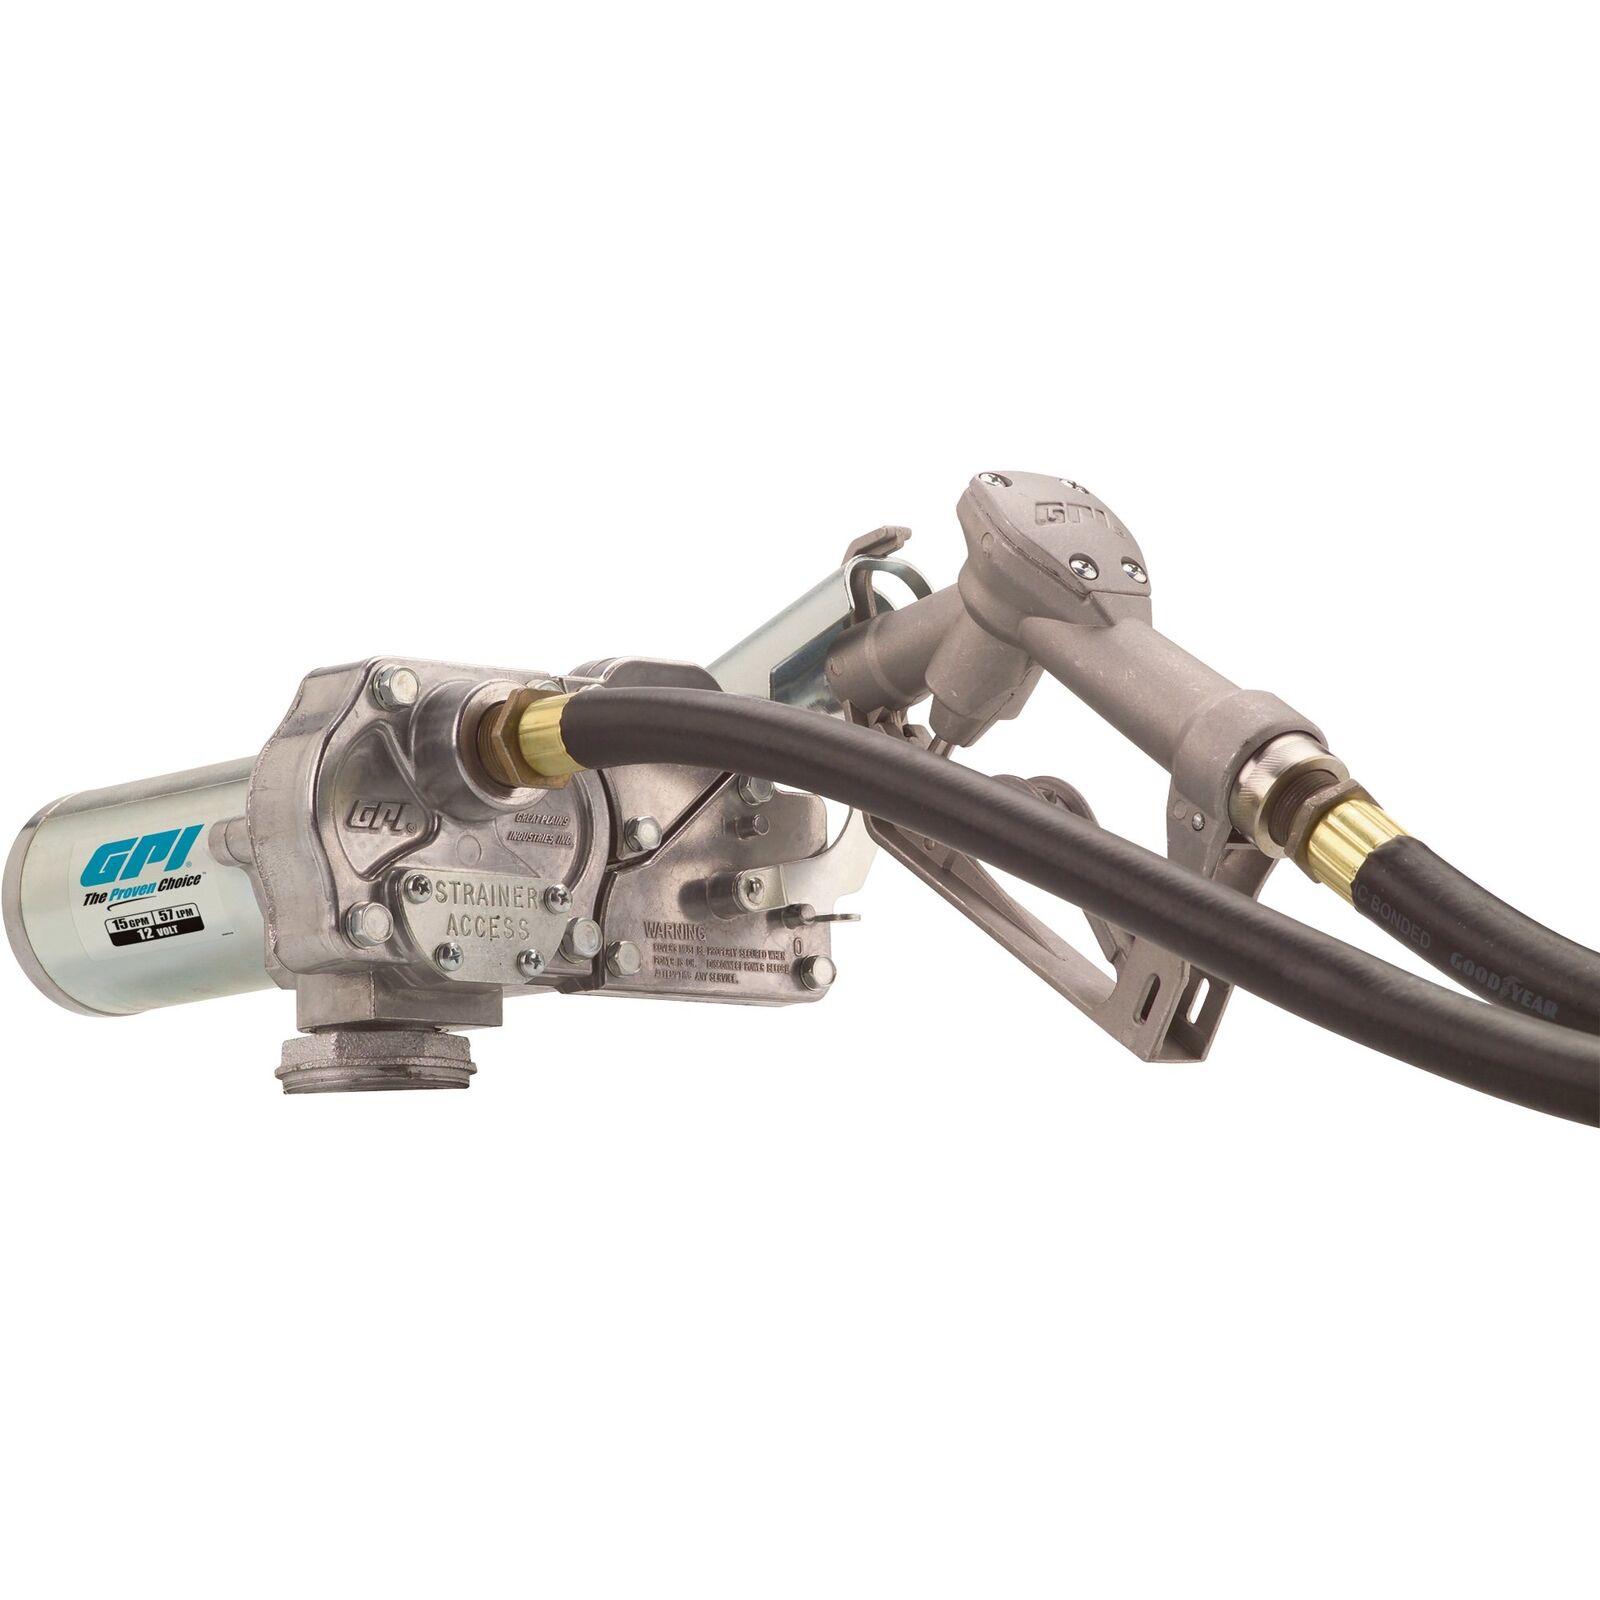 s l1600 gpi pump ebay  at pacquiaovsvargaslive.co